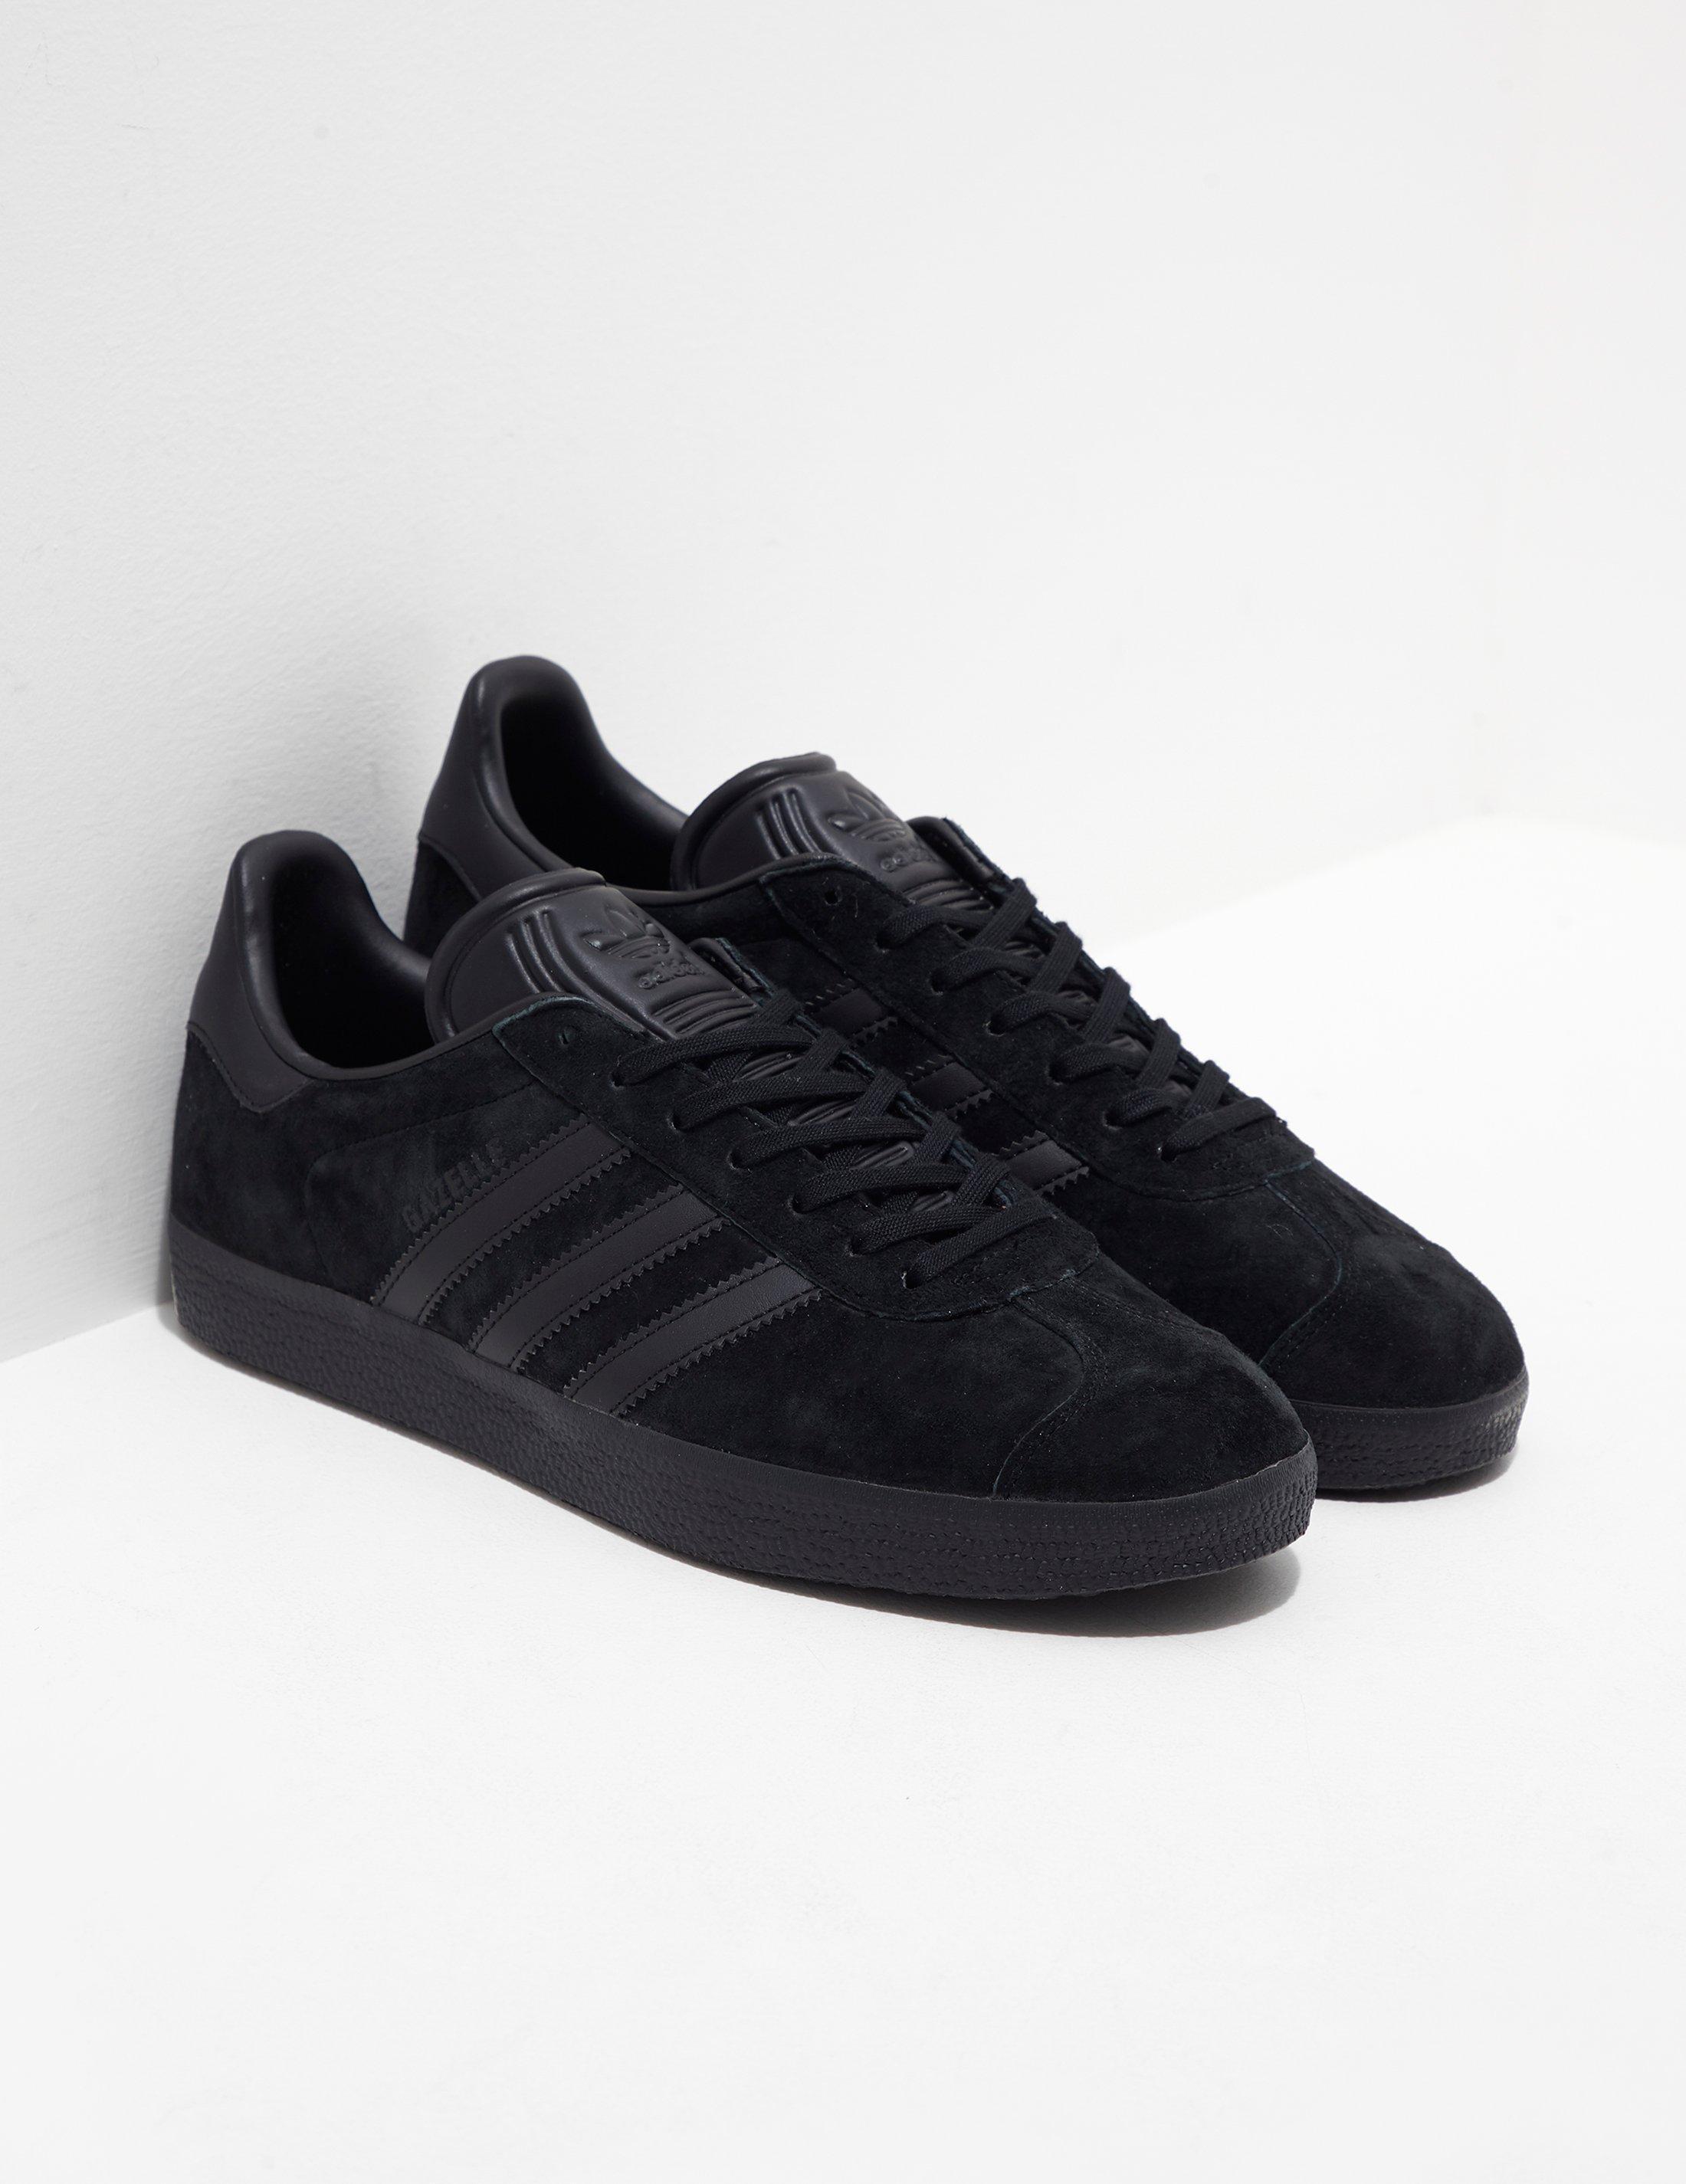 c09a17f6ea adidas Originals Gazelle Black in Black for Men - Lyst